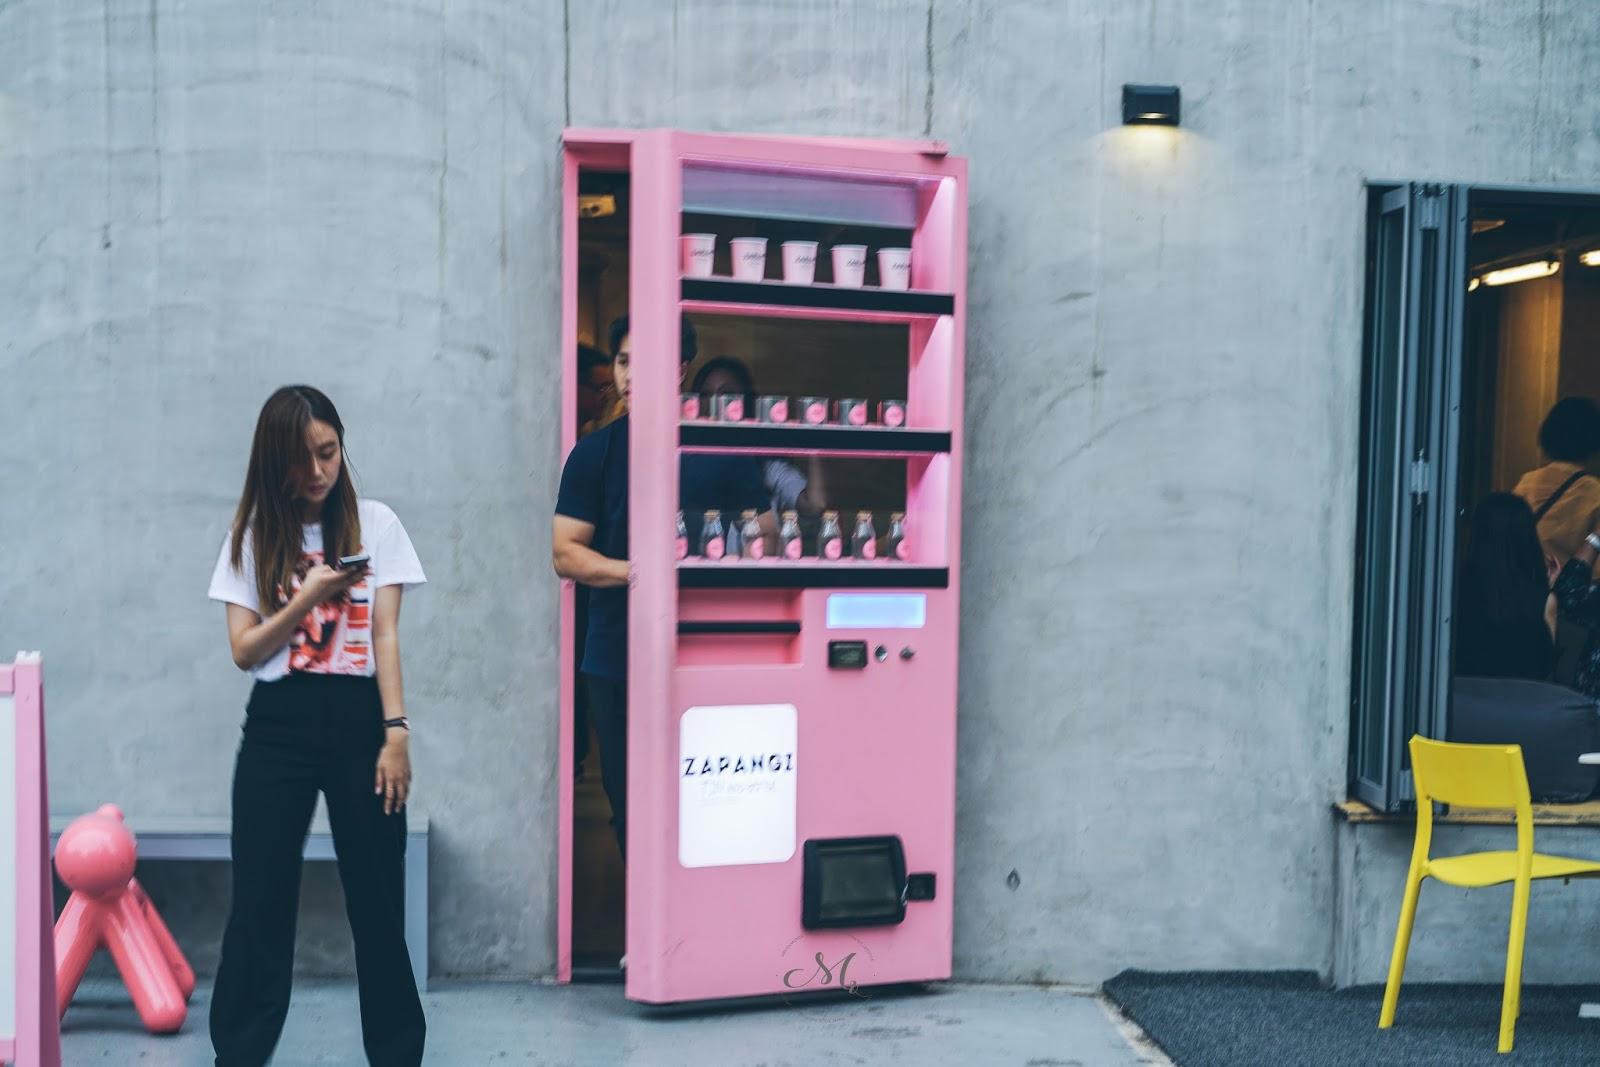 zapangi the pink vending machine cafe mini en monde. Black Bedroom Furniture Sets. Home Design Ideas